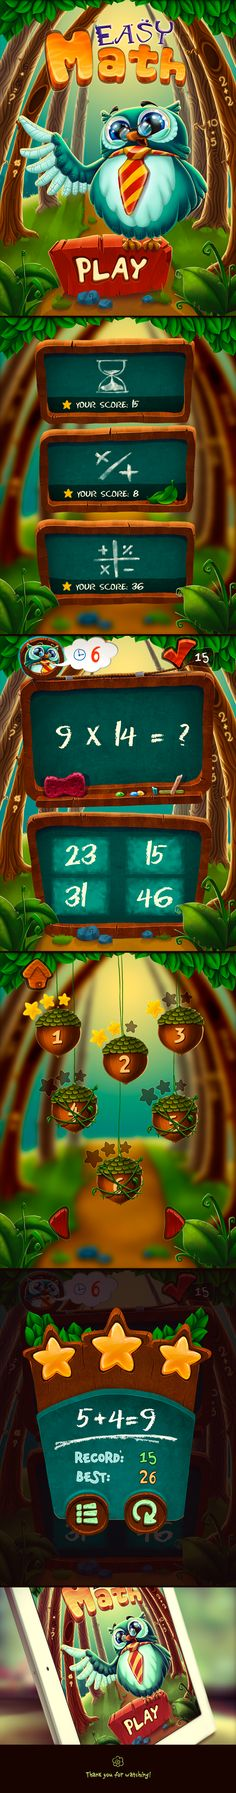 Game Easy math on Behance